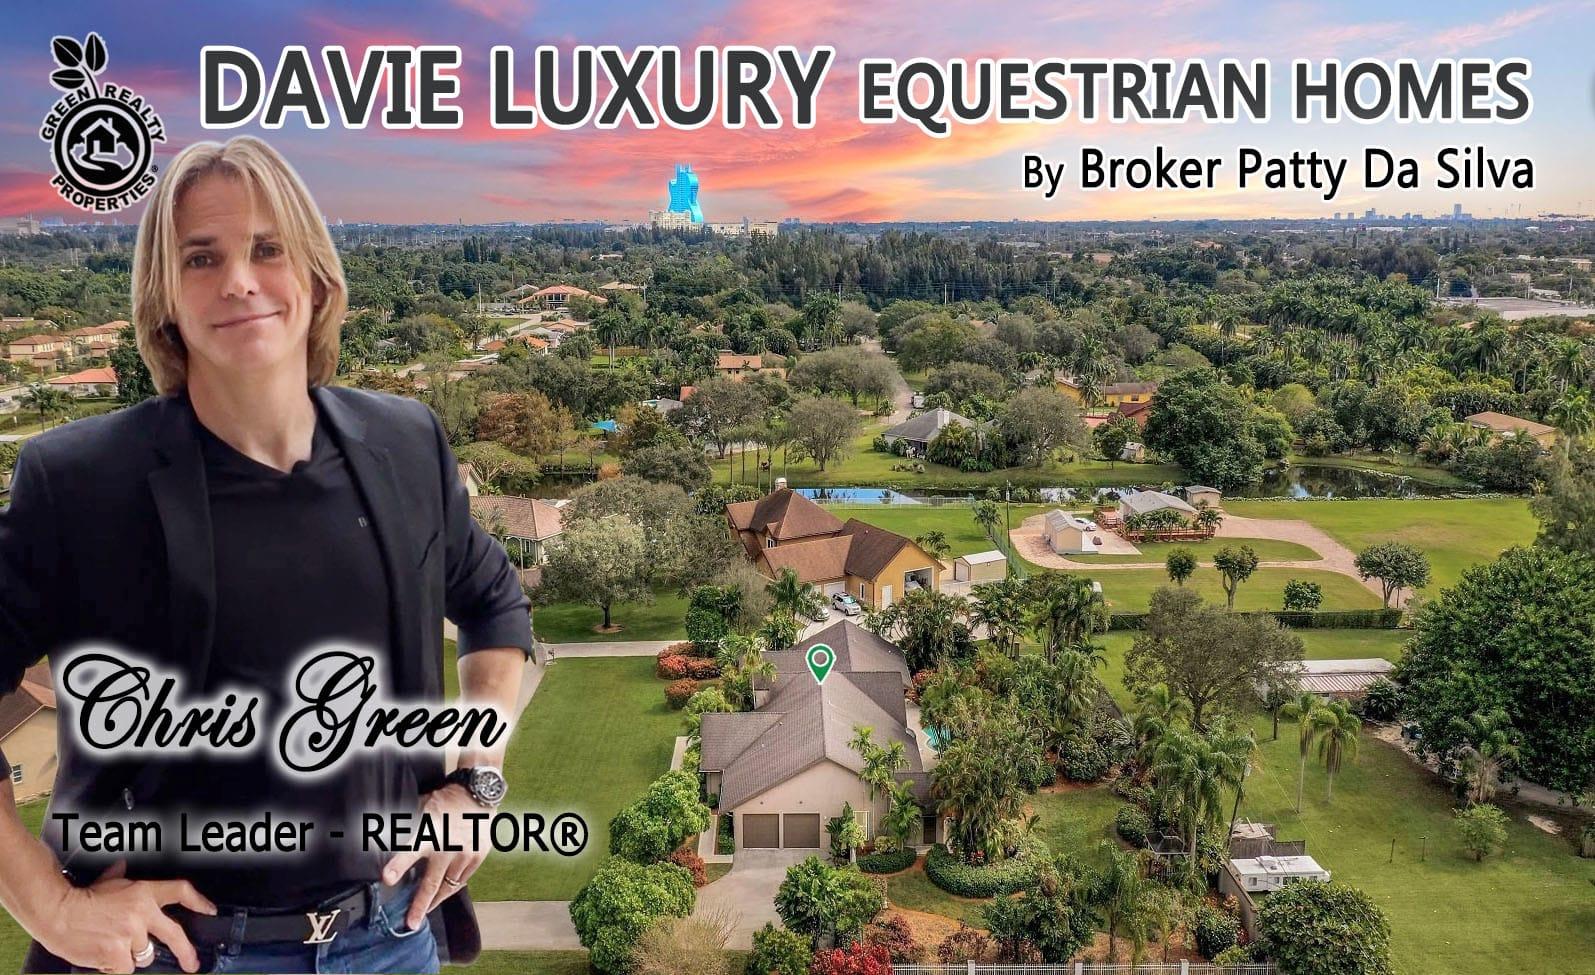 Davie Luxury Equestrian Homes